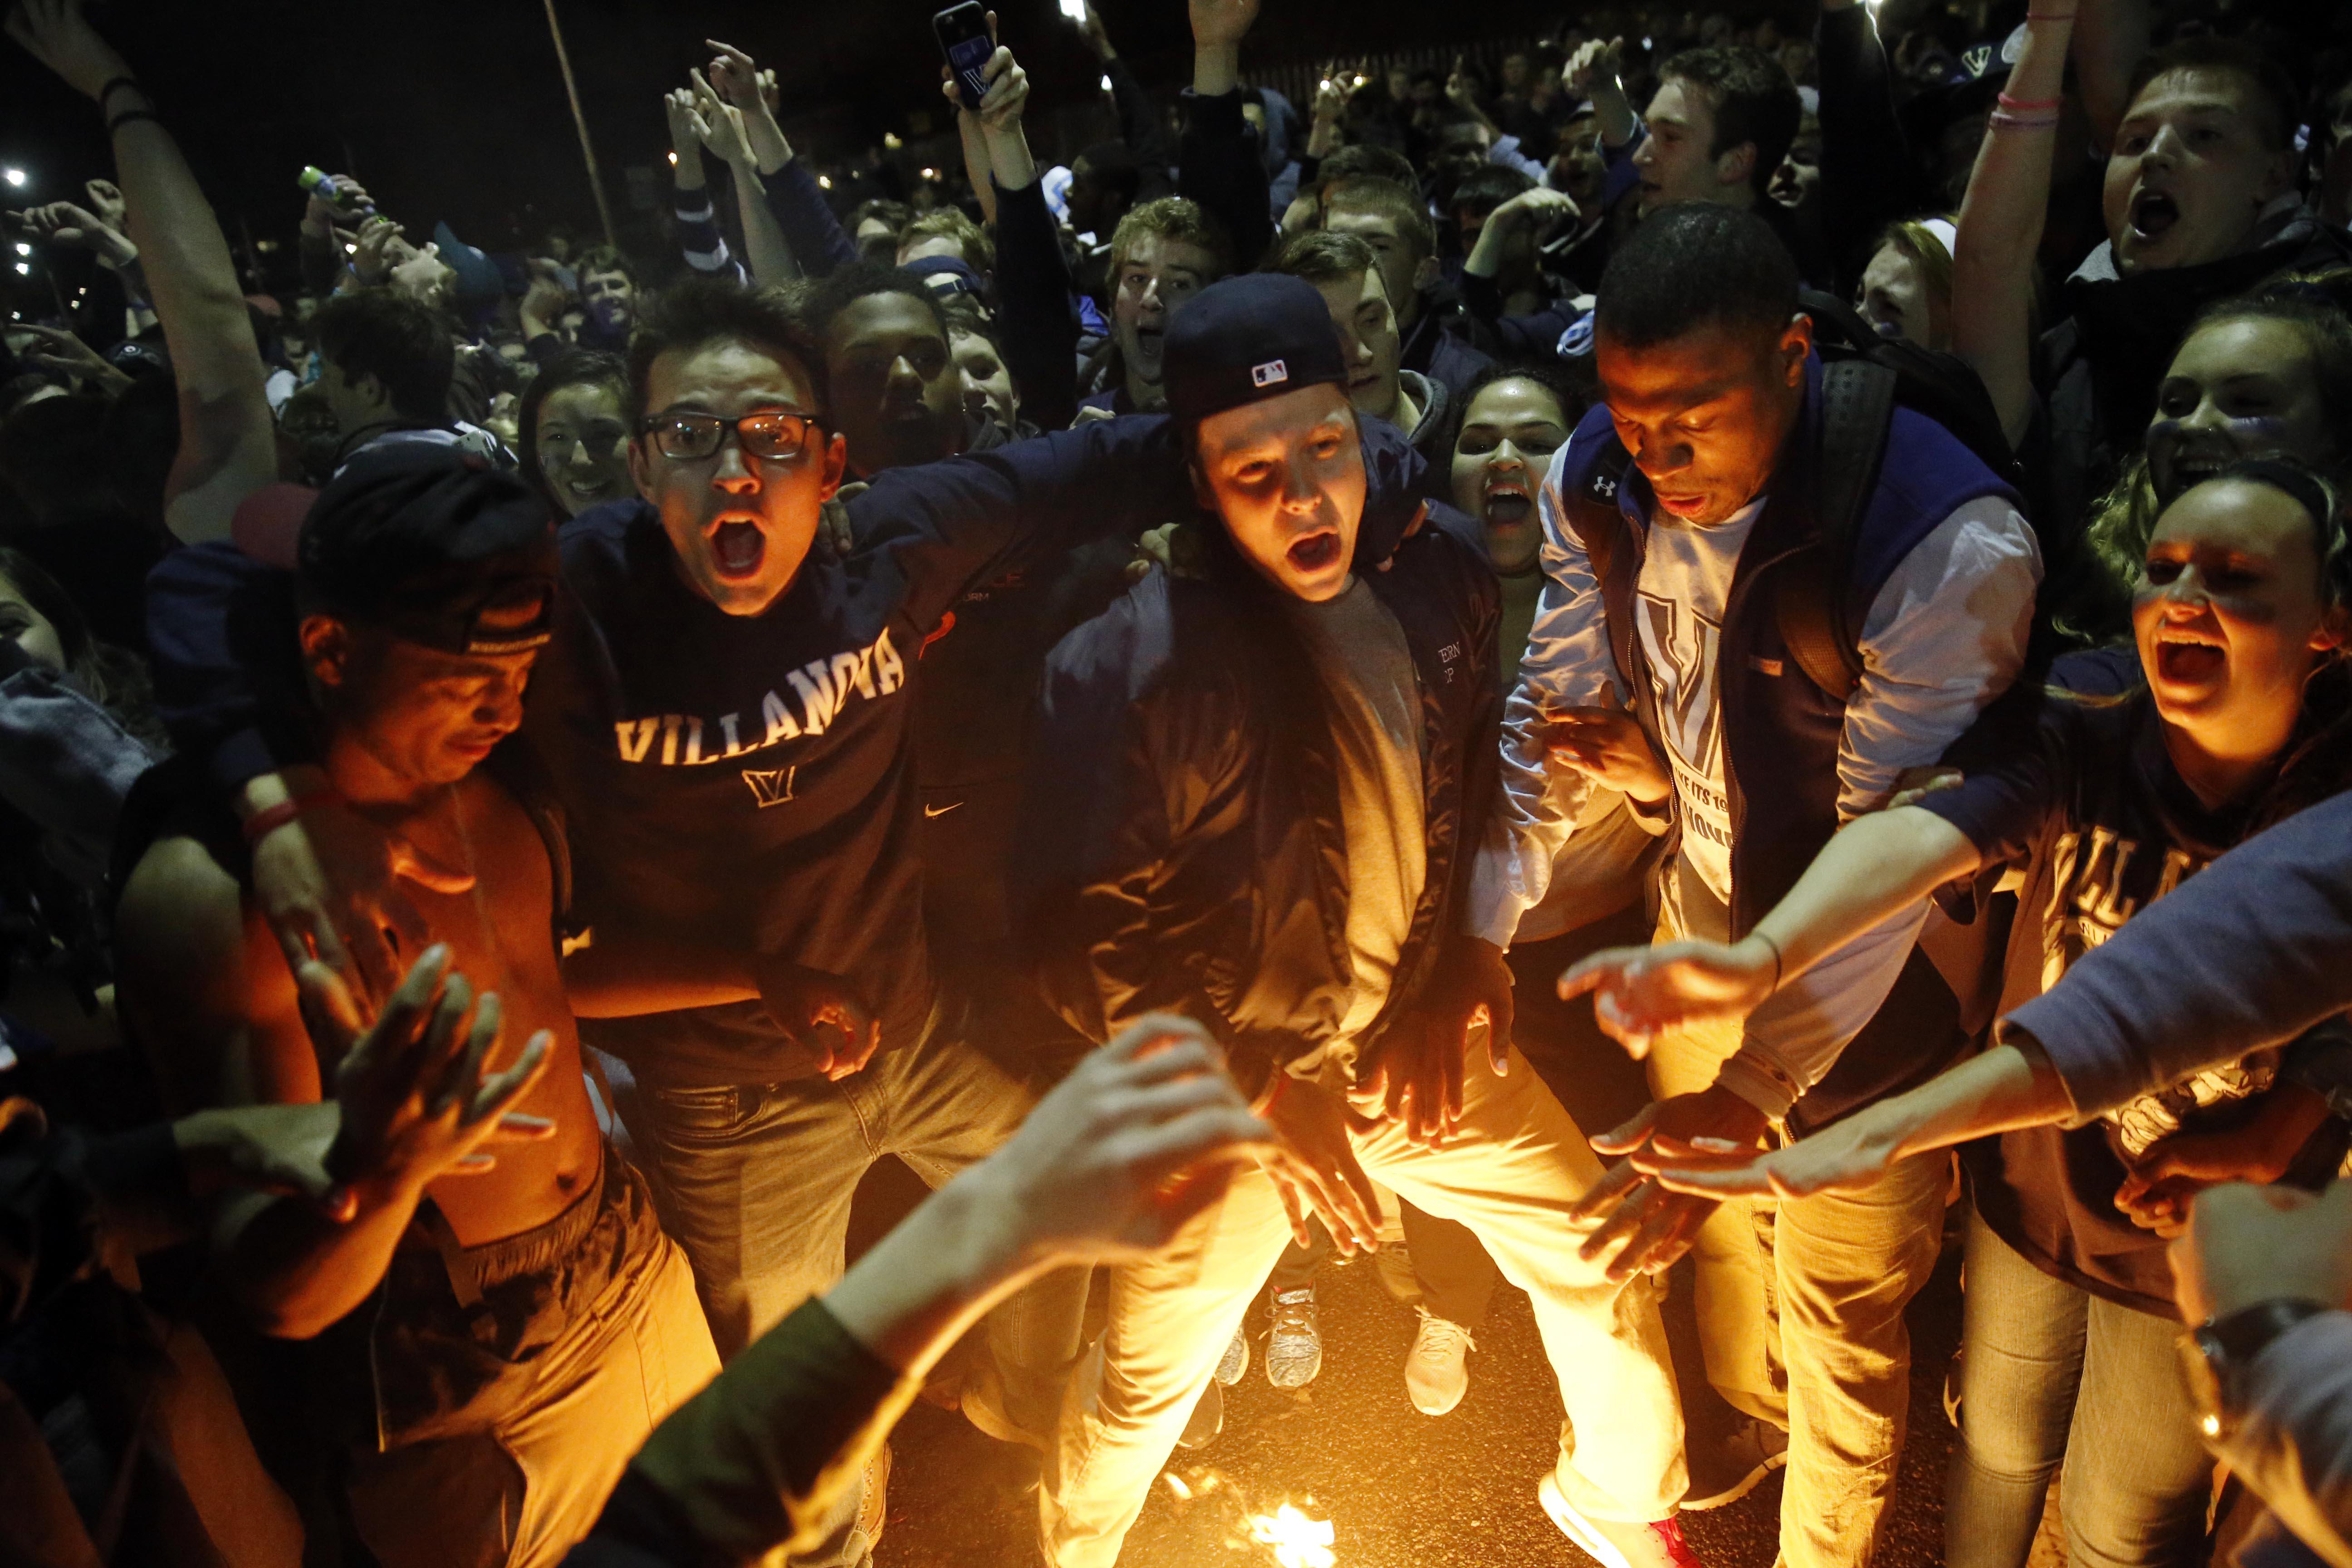 Villanova basketball fans celebrate after Villanova defeated North Carolina in the college basketball championship game of the NCAA Tournament, Tuesday, April 5, 2016, in Villanova, Pa. Villanova won 77-74. (AP Photo/Matt Rourke)